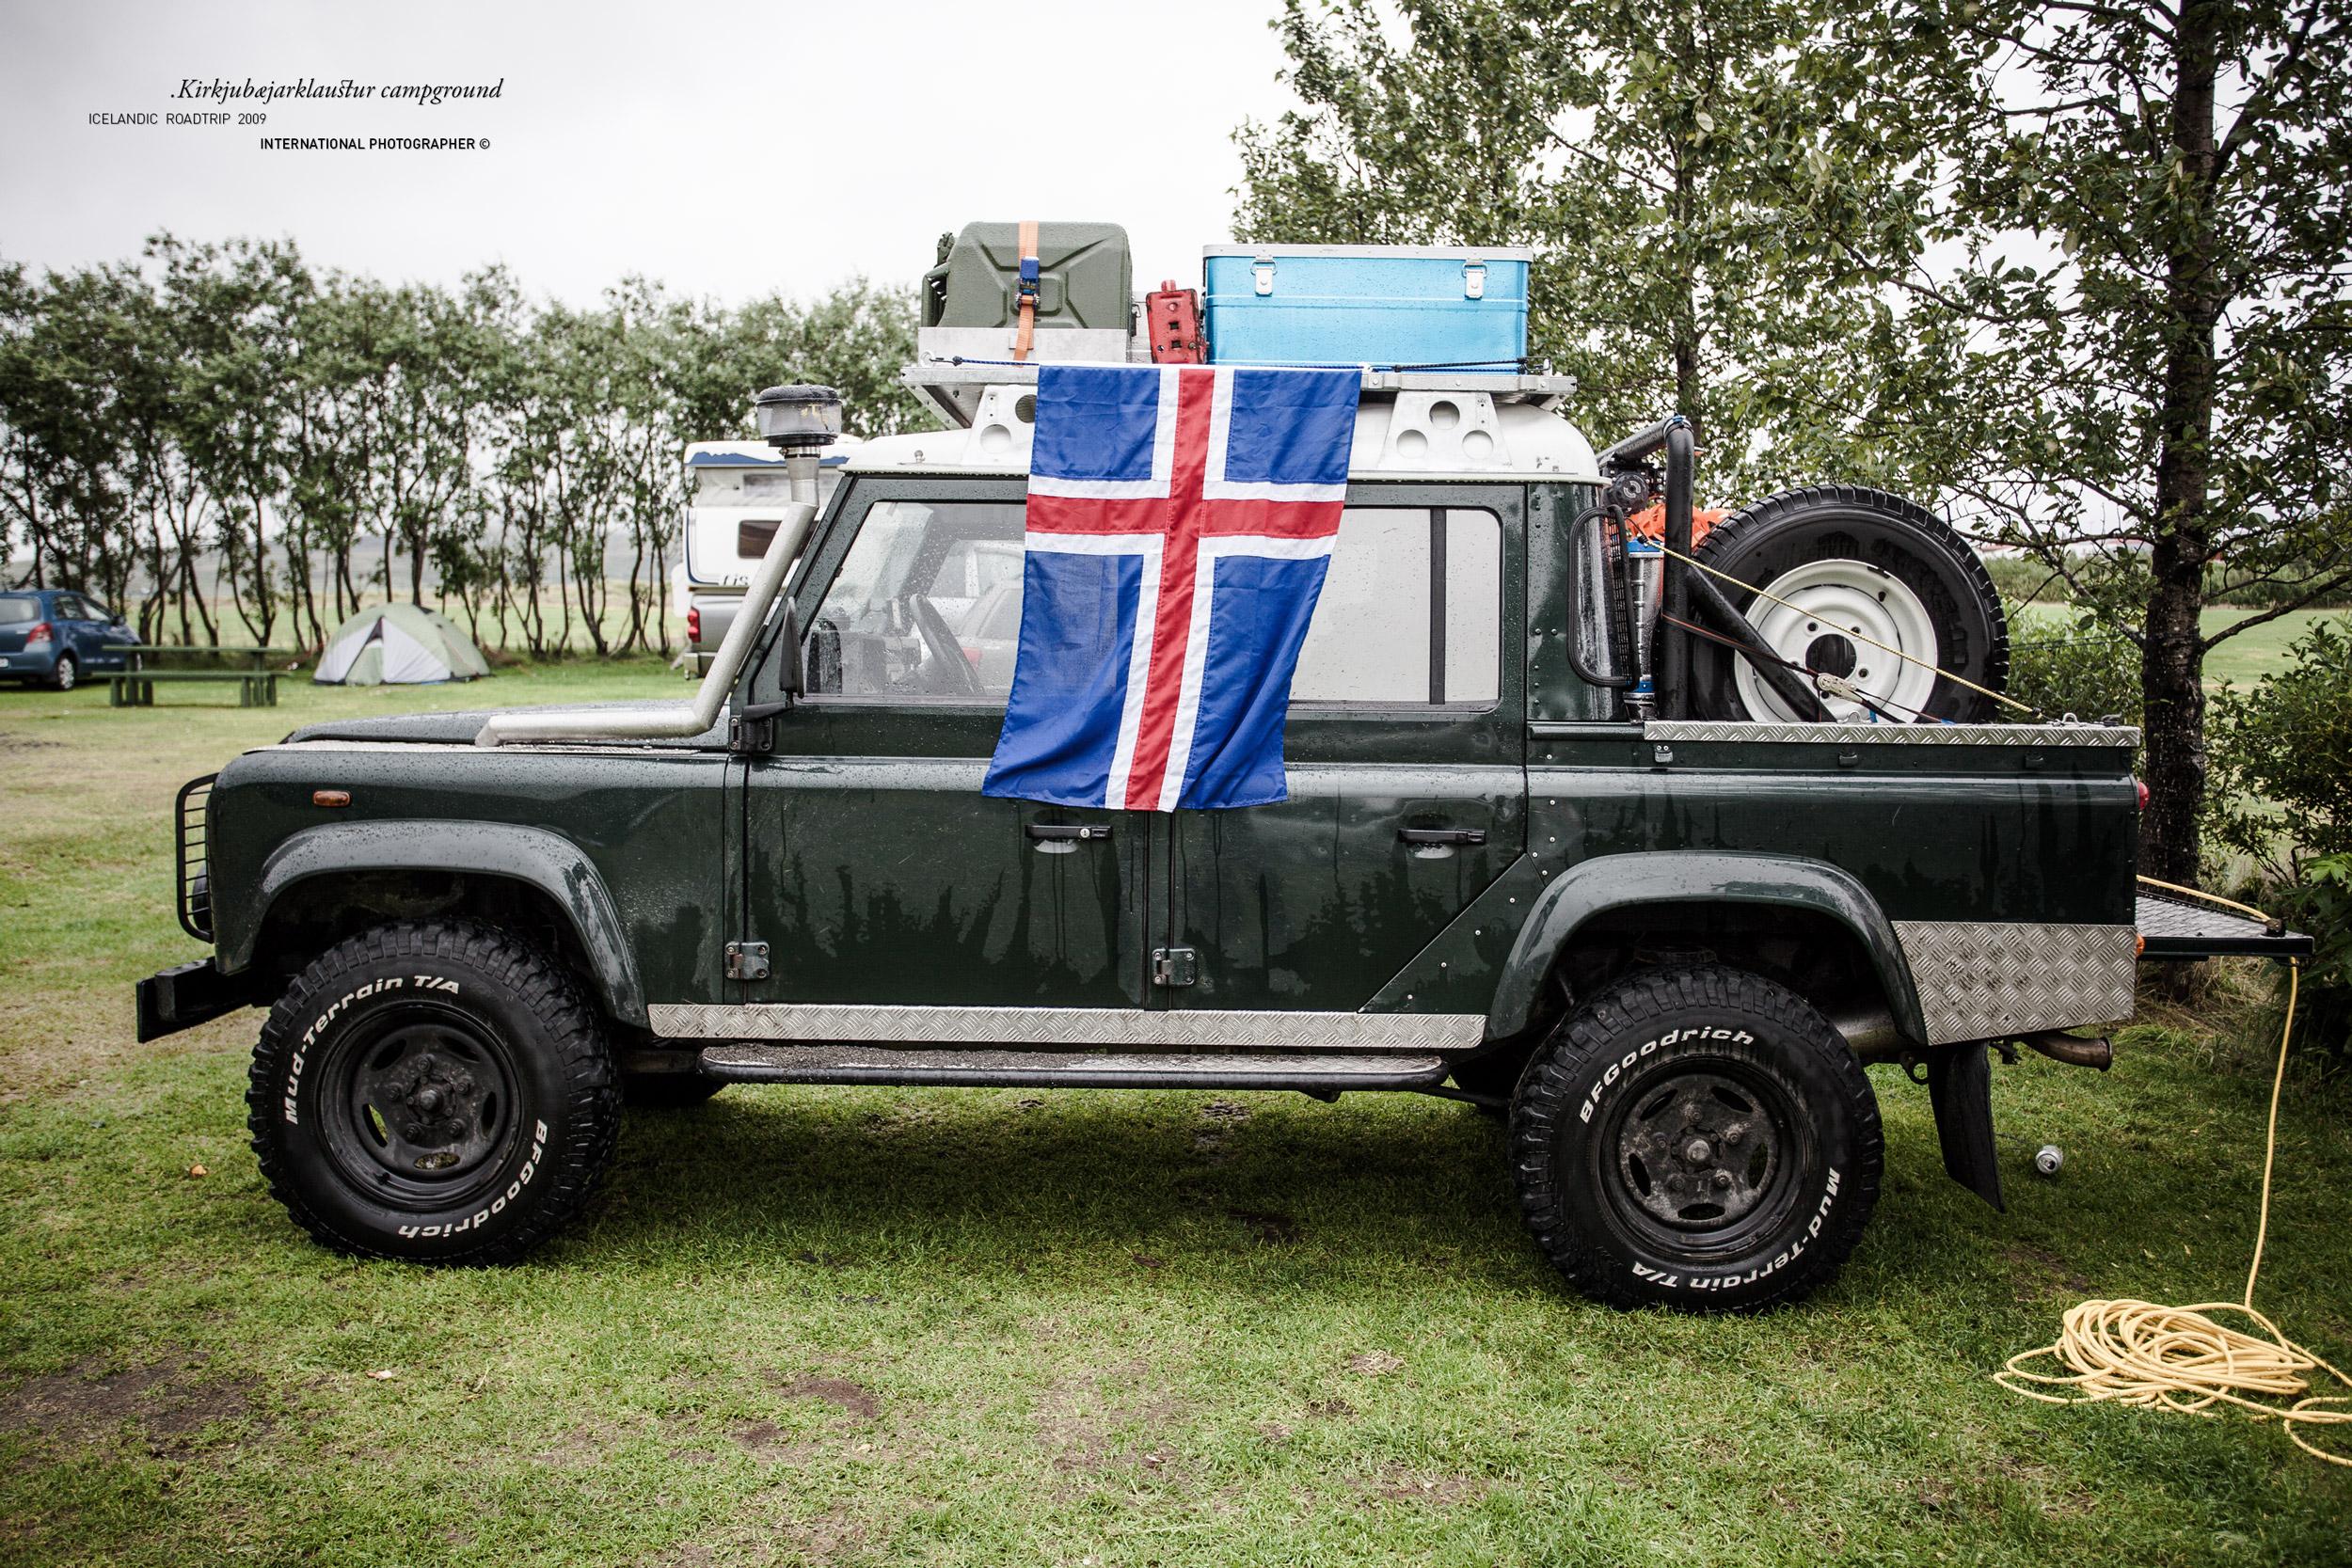 Land Rover avec le drapeau islandais au camping de Kirkjubæjarklaustur